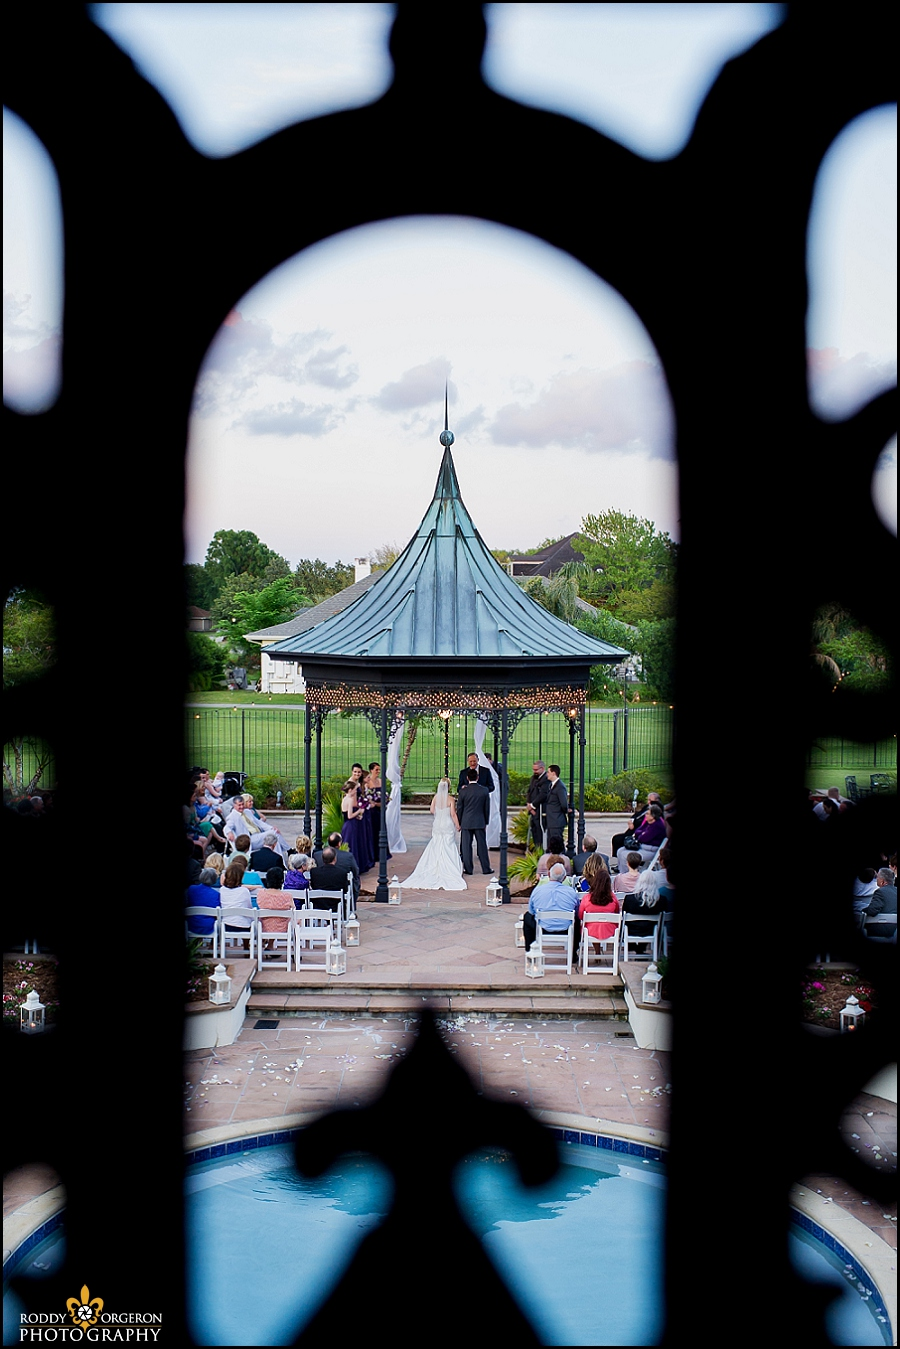 Chateau Country Club weddings